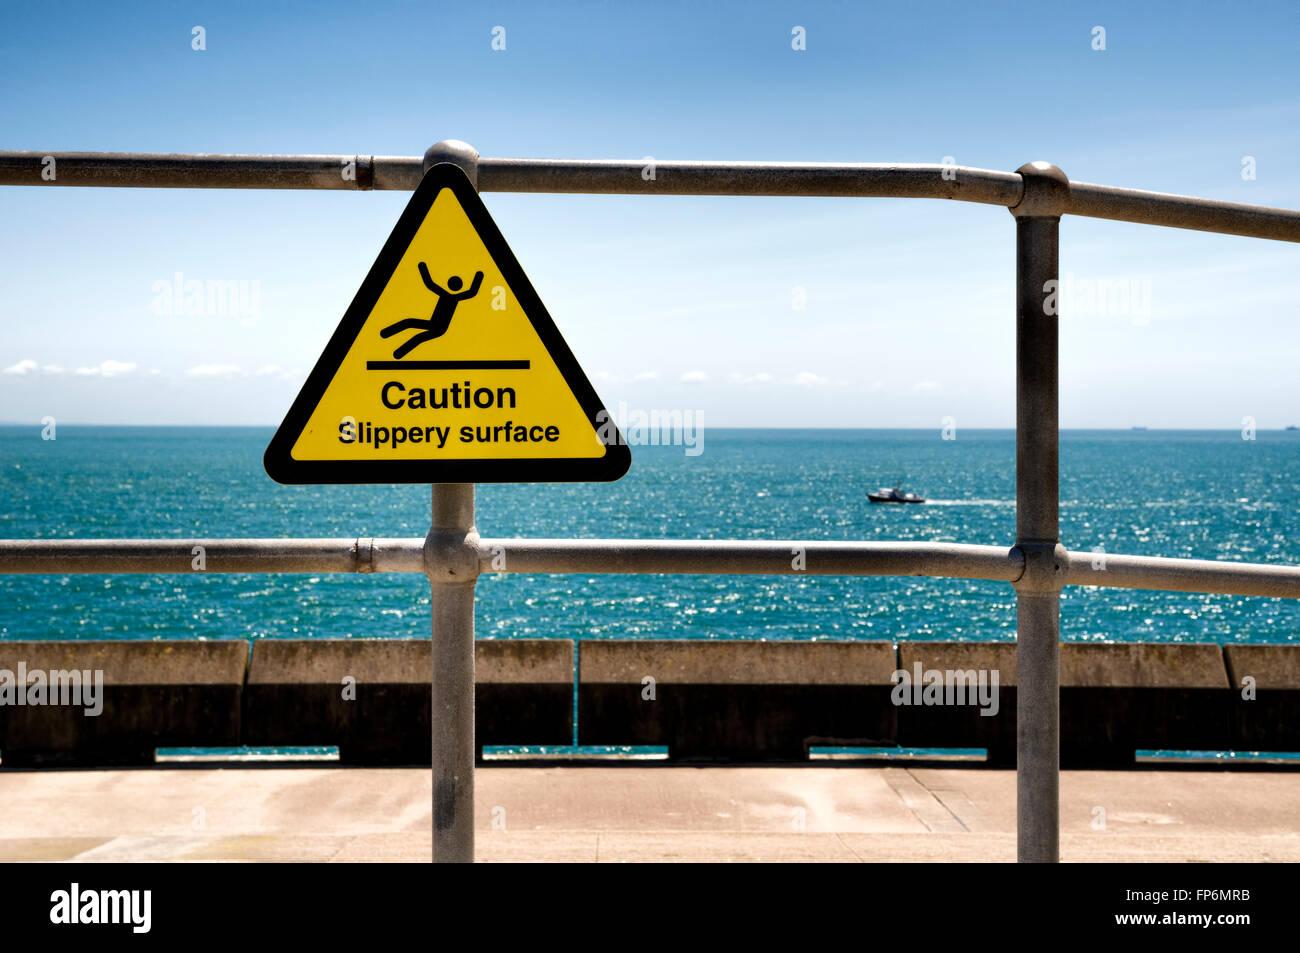 Slippery surface Warning sign at Samphire Hoe near Dover Uk - Stock Image